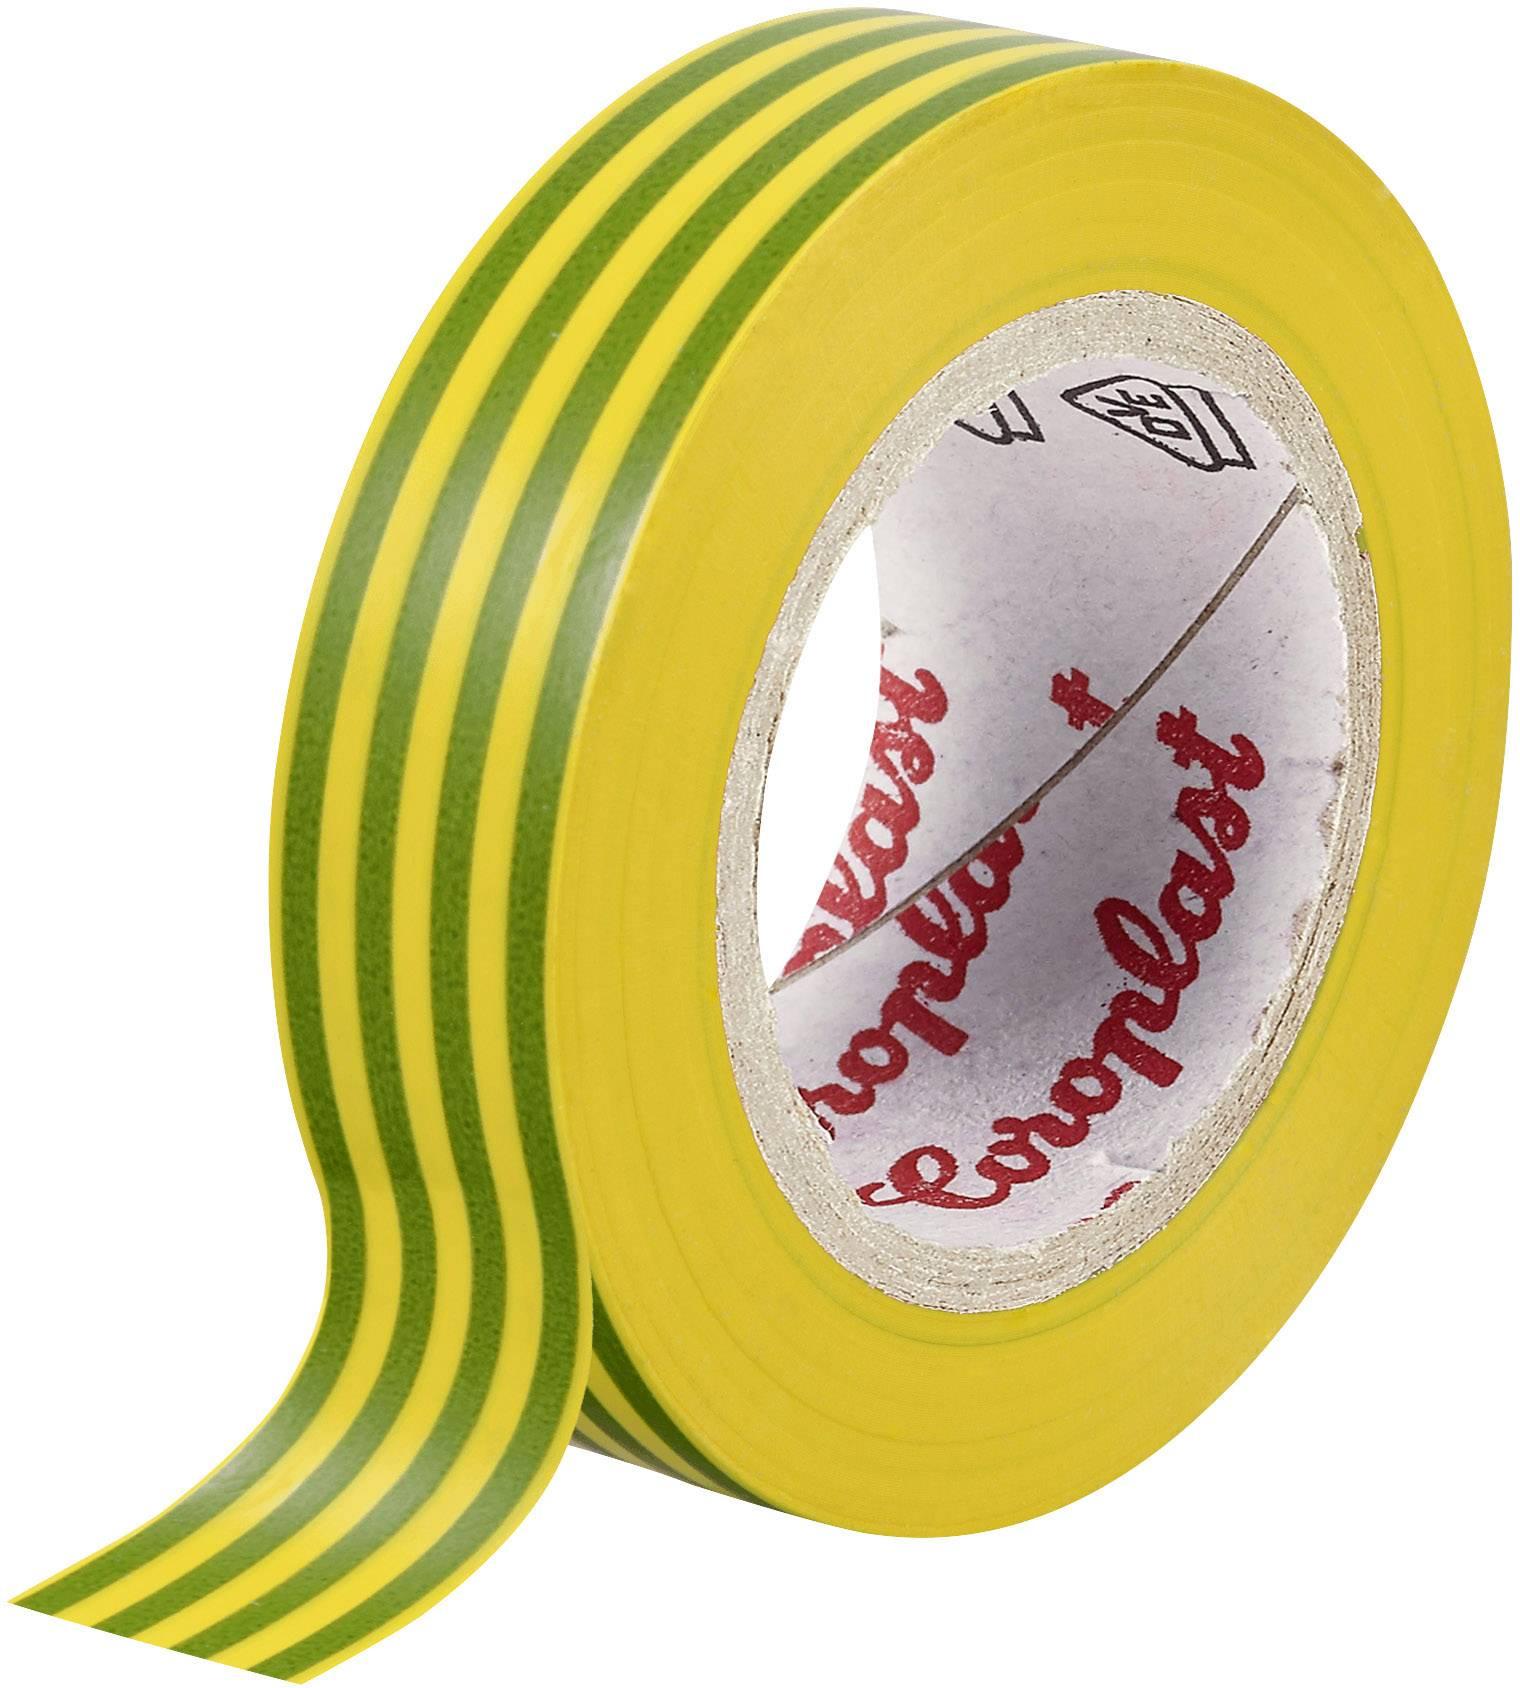 Izolačná páska Coroplast 302 302, (d x š) 25 m x 19 mm, zelenožltá, 1 roliek